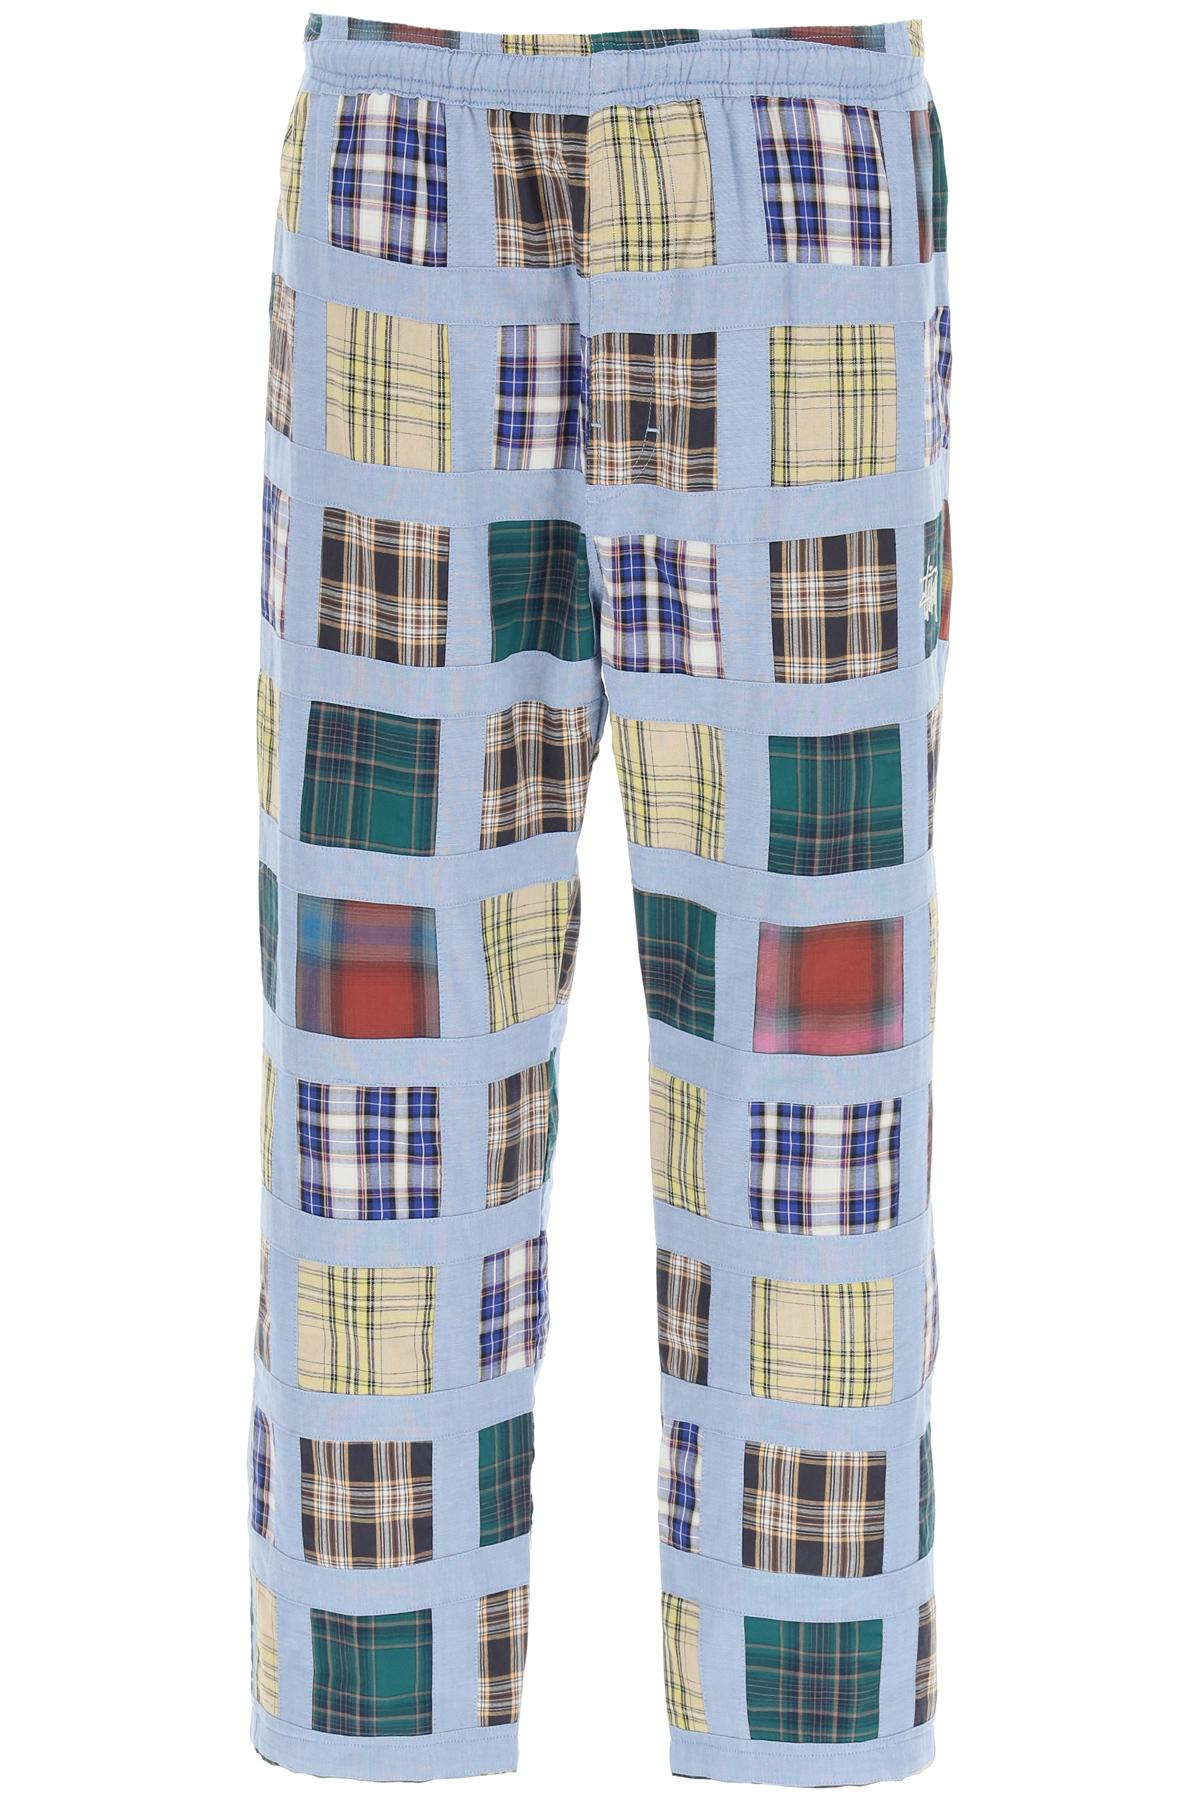 Stussy pantaloni madras patchwork